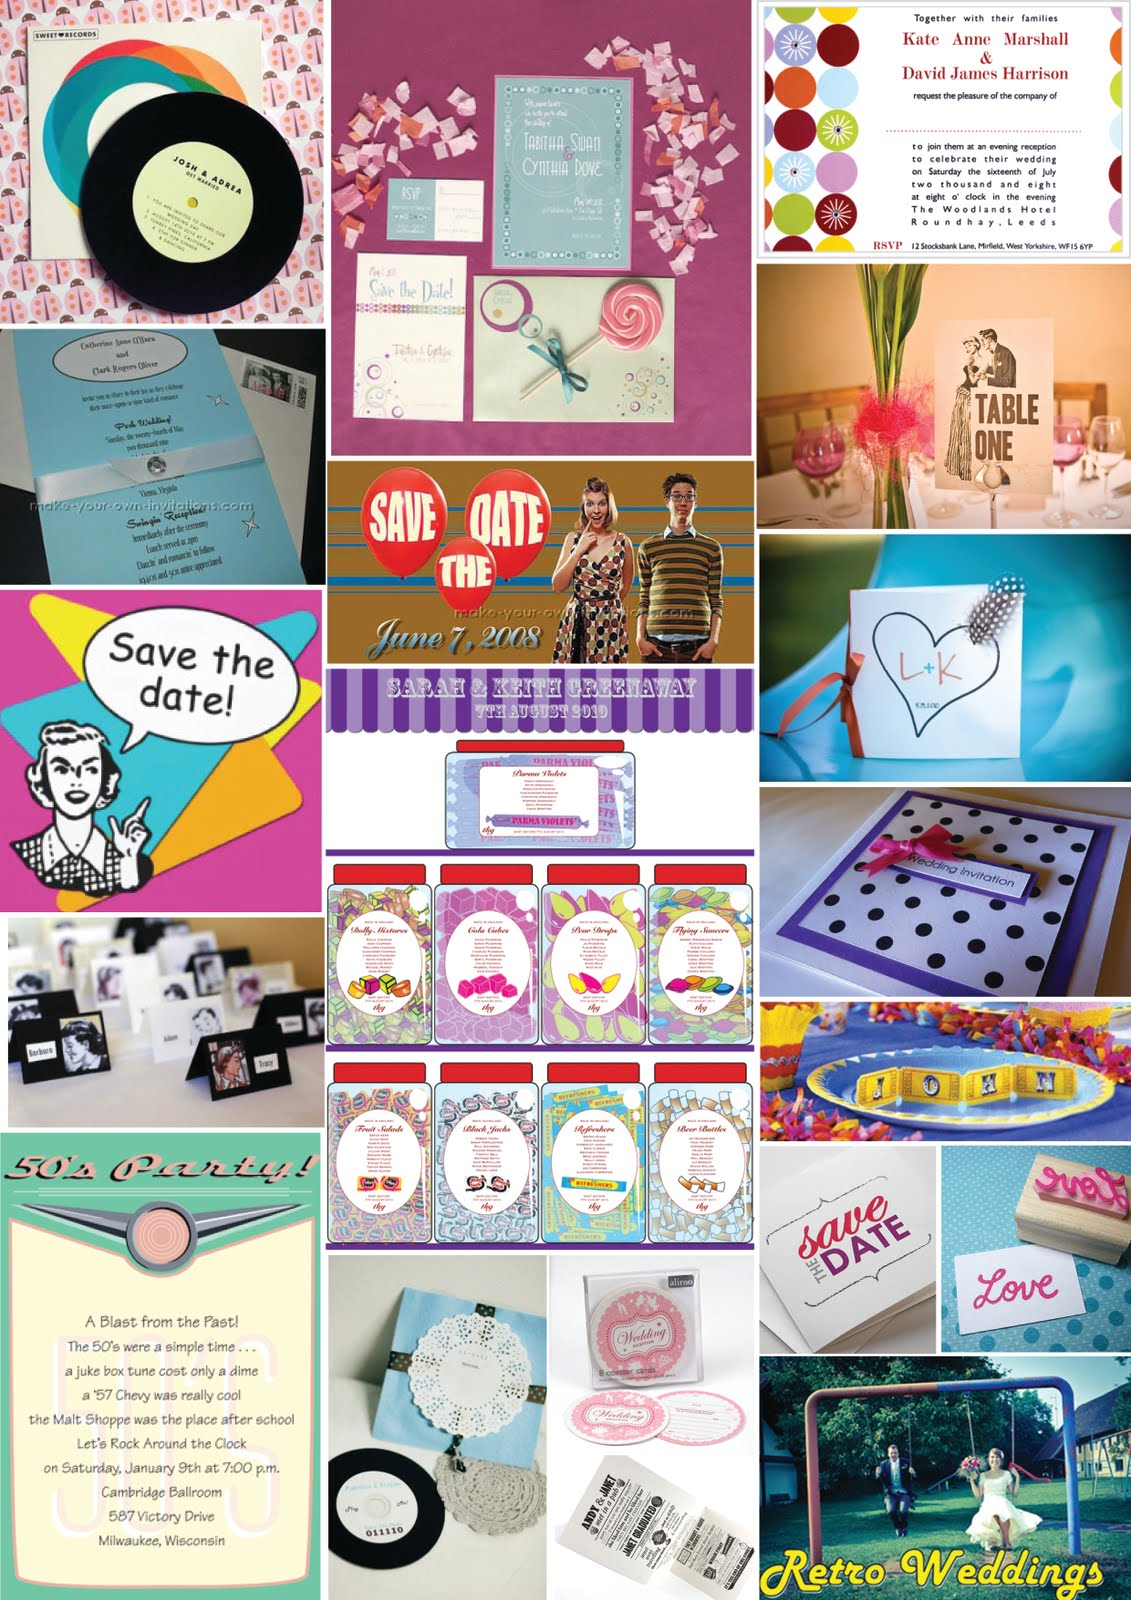 http://4.bp.blogspot.com/-GiEOJHFxNis/Tfh1-LvS4jI/AAAAAAAABIY/BNrB3s6eG6o/s1600/Stationery+copy.jpg